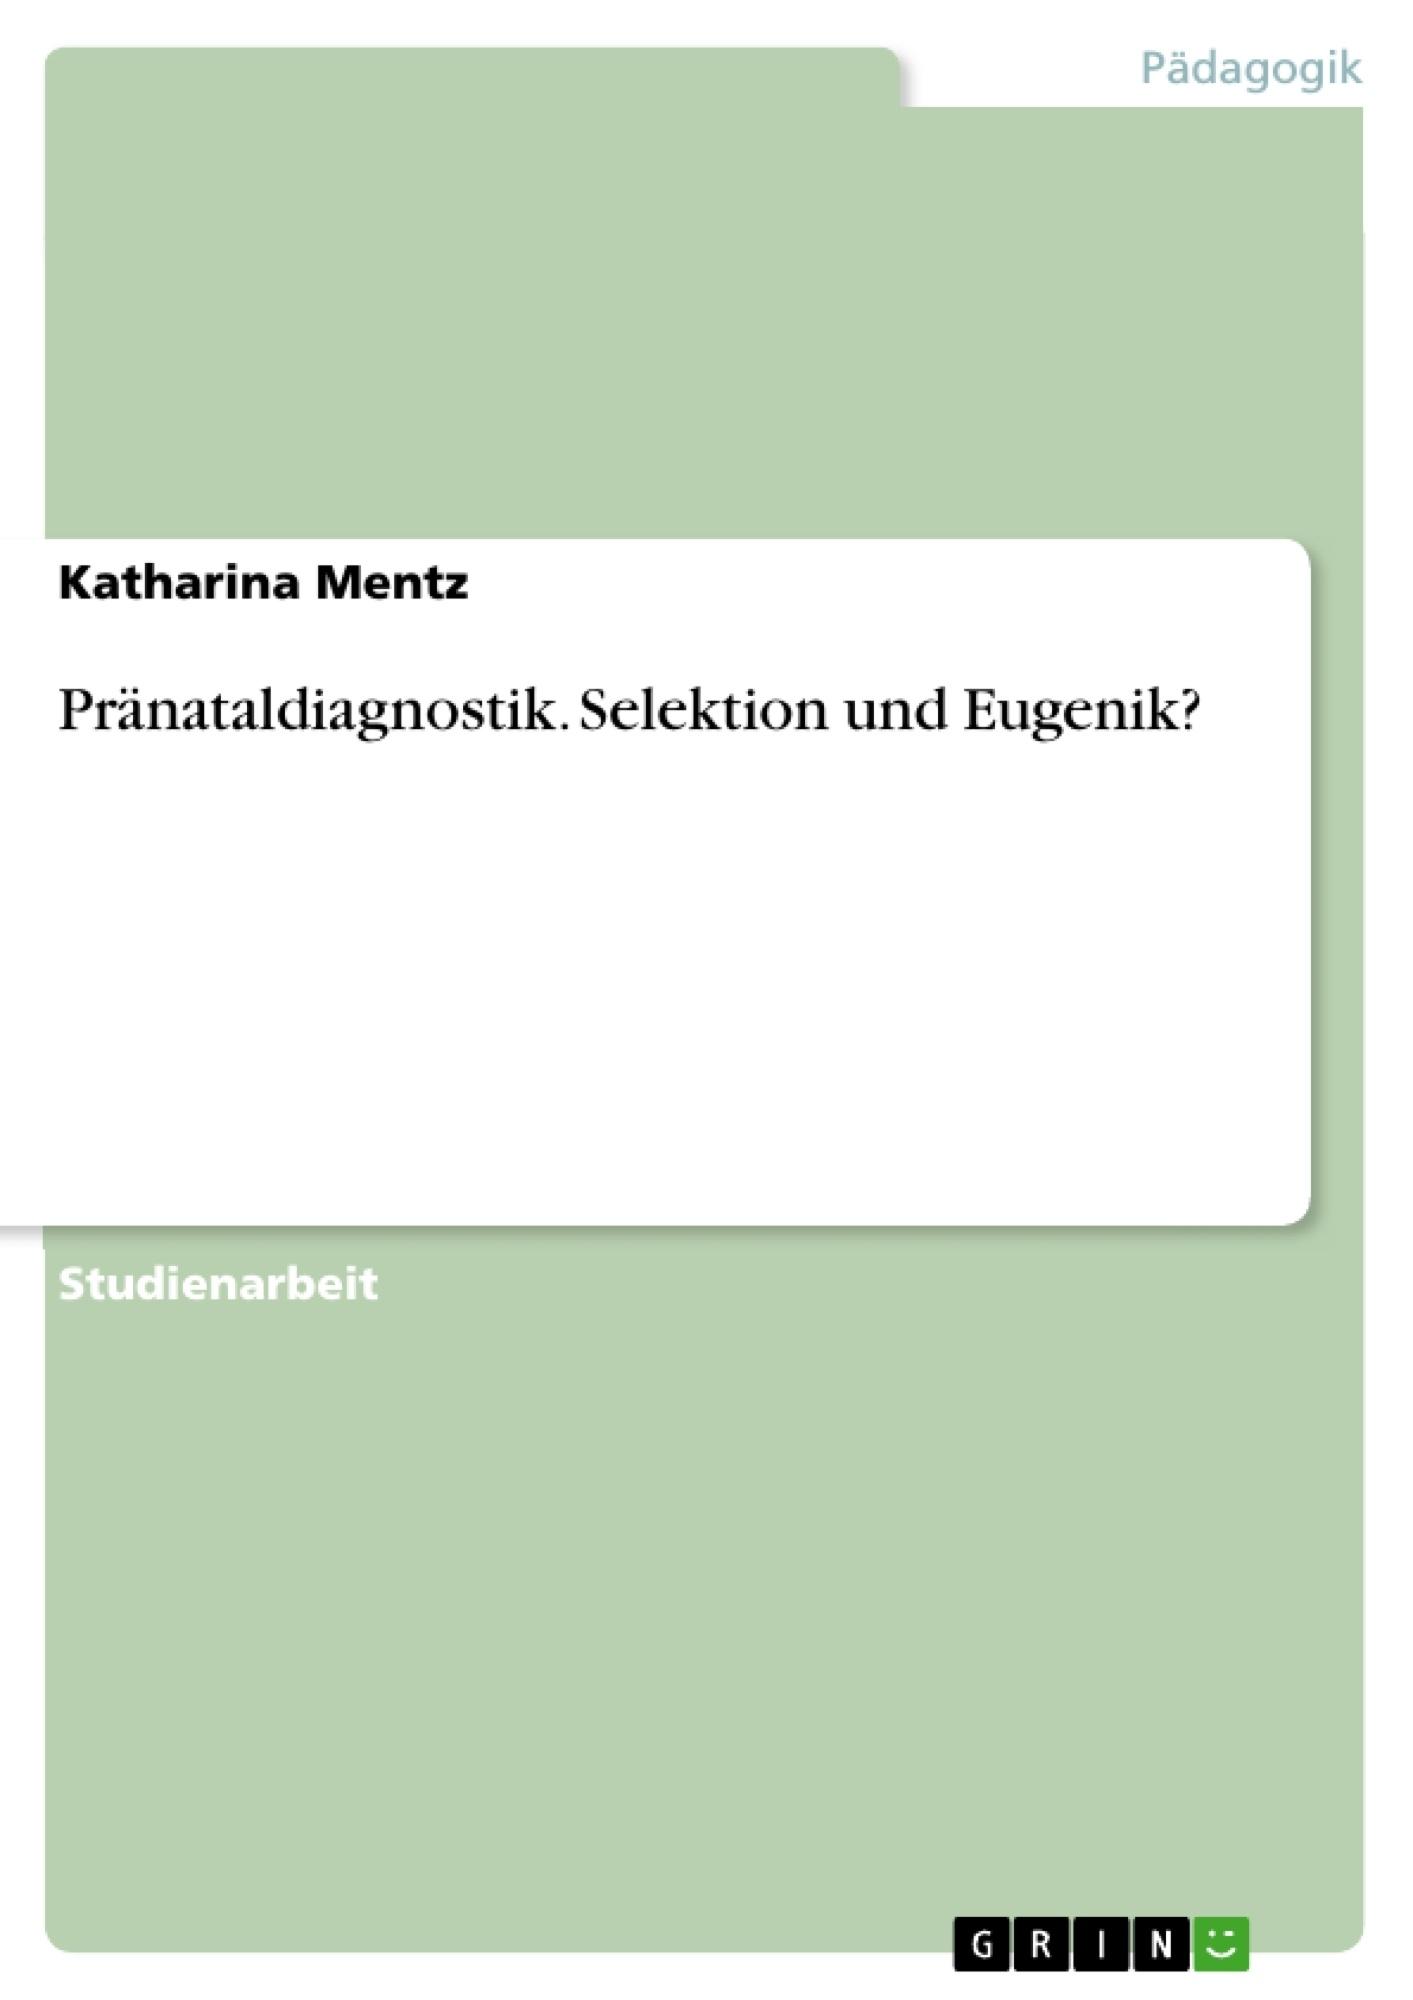 Titel: Pränataldiagnostik. Selektion und Eugenik?